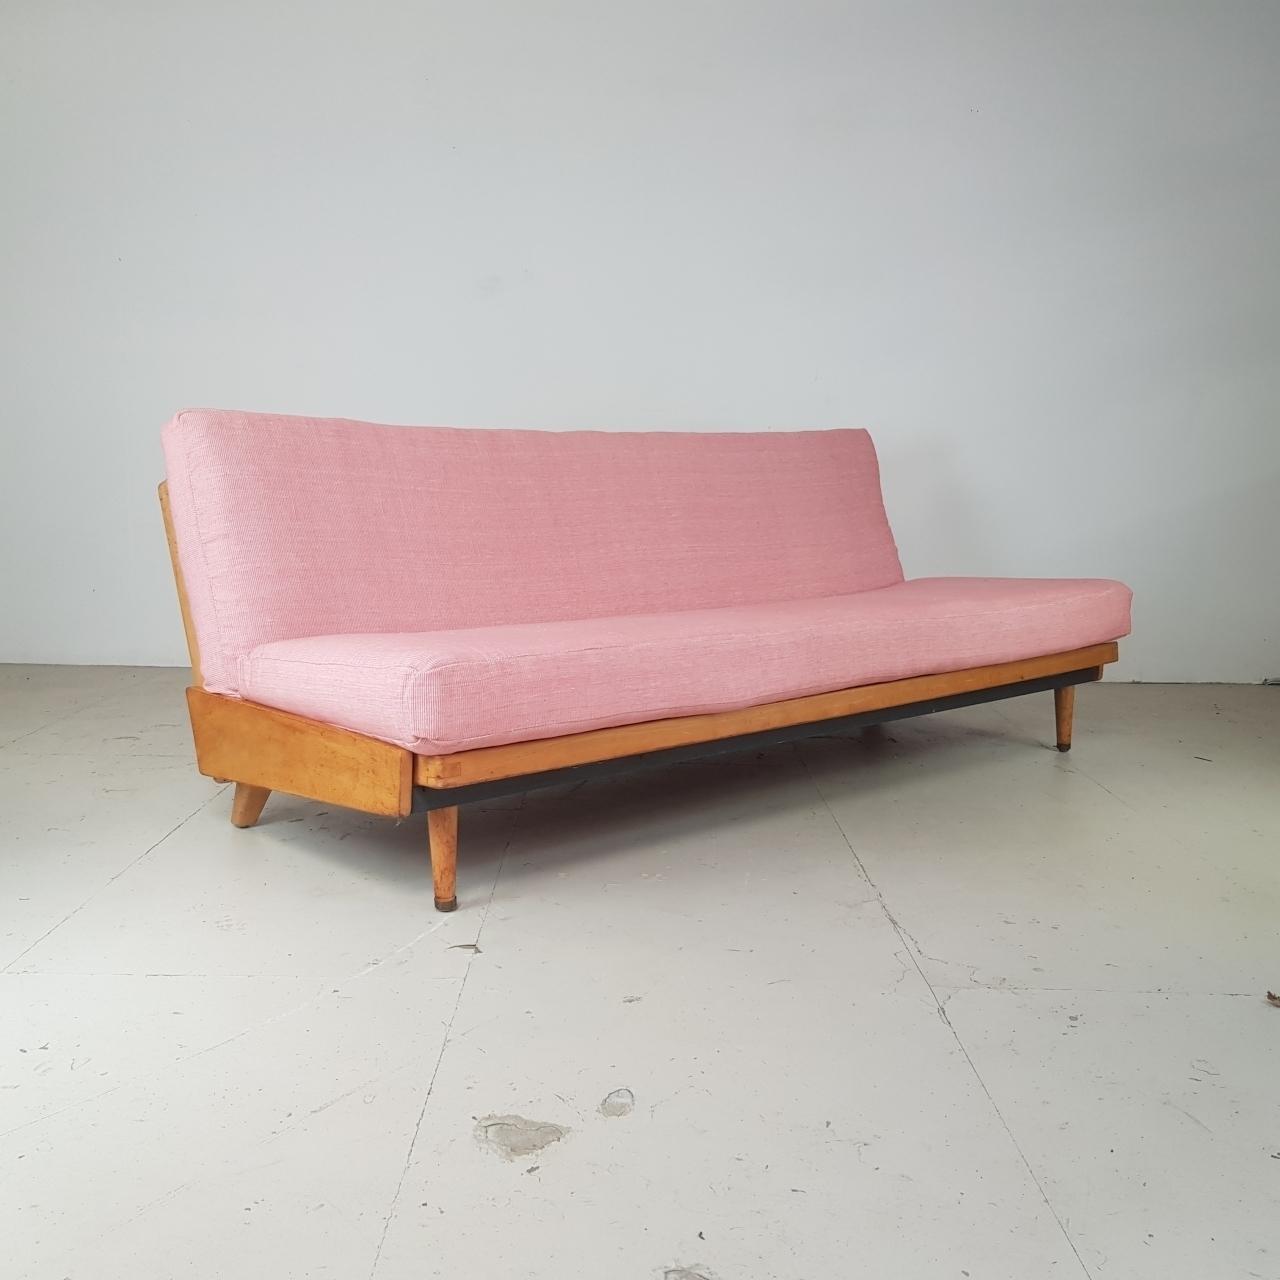 Vintage Midcentury Danish Sofa Bed | Vinterior